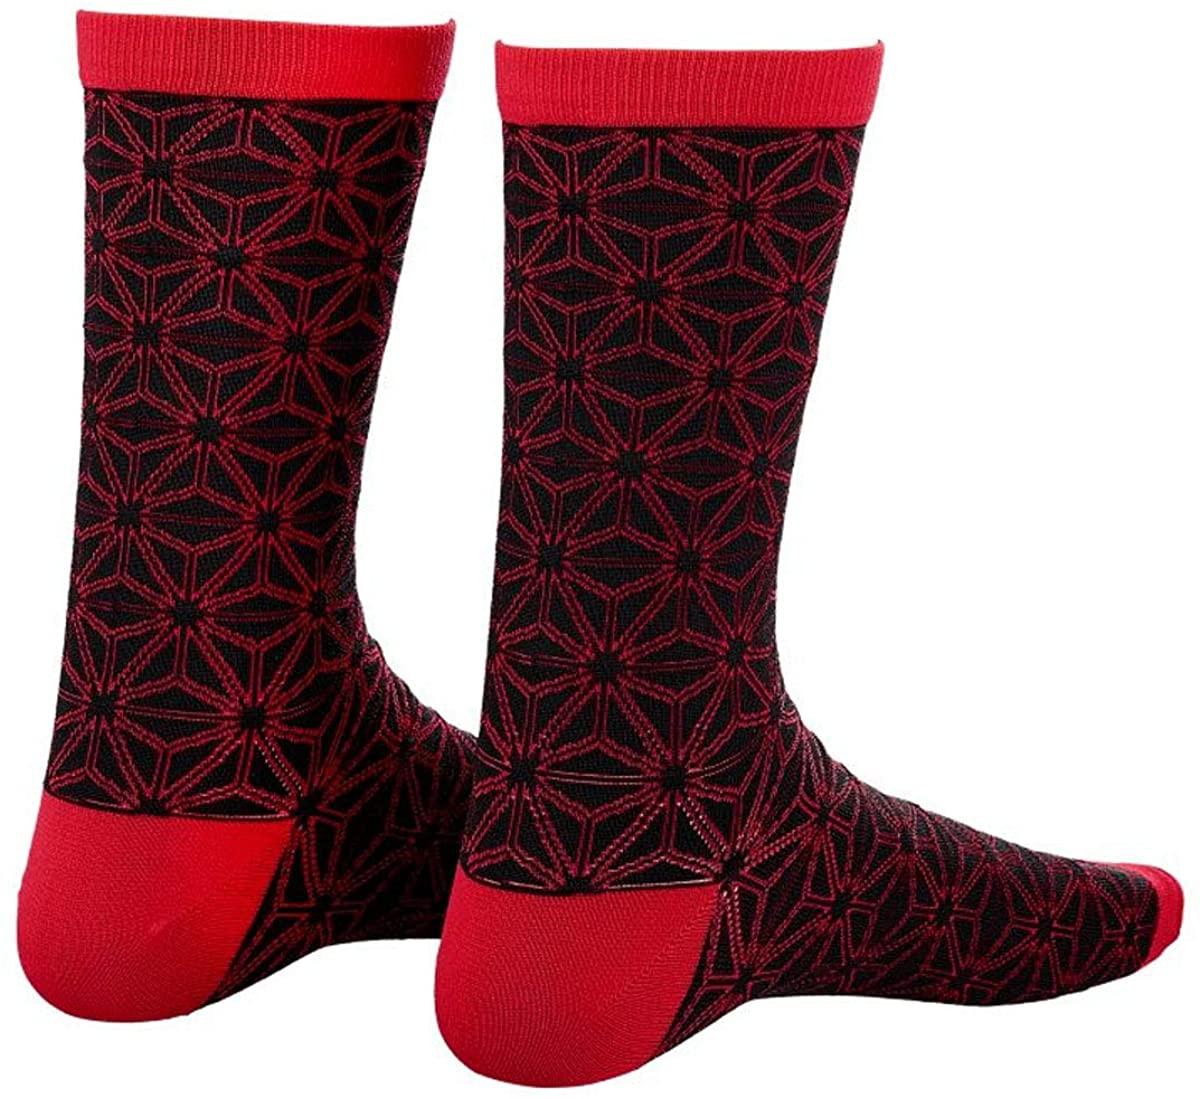 Supacaz SupaSox Asanoha Socks - Black & Red - SX-50